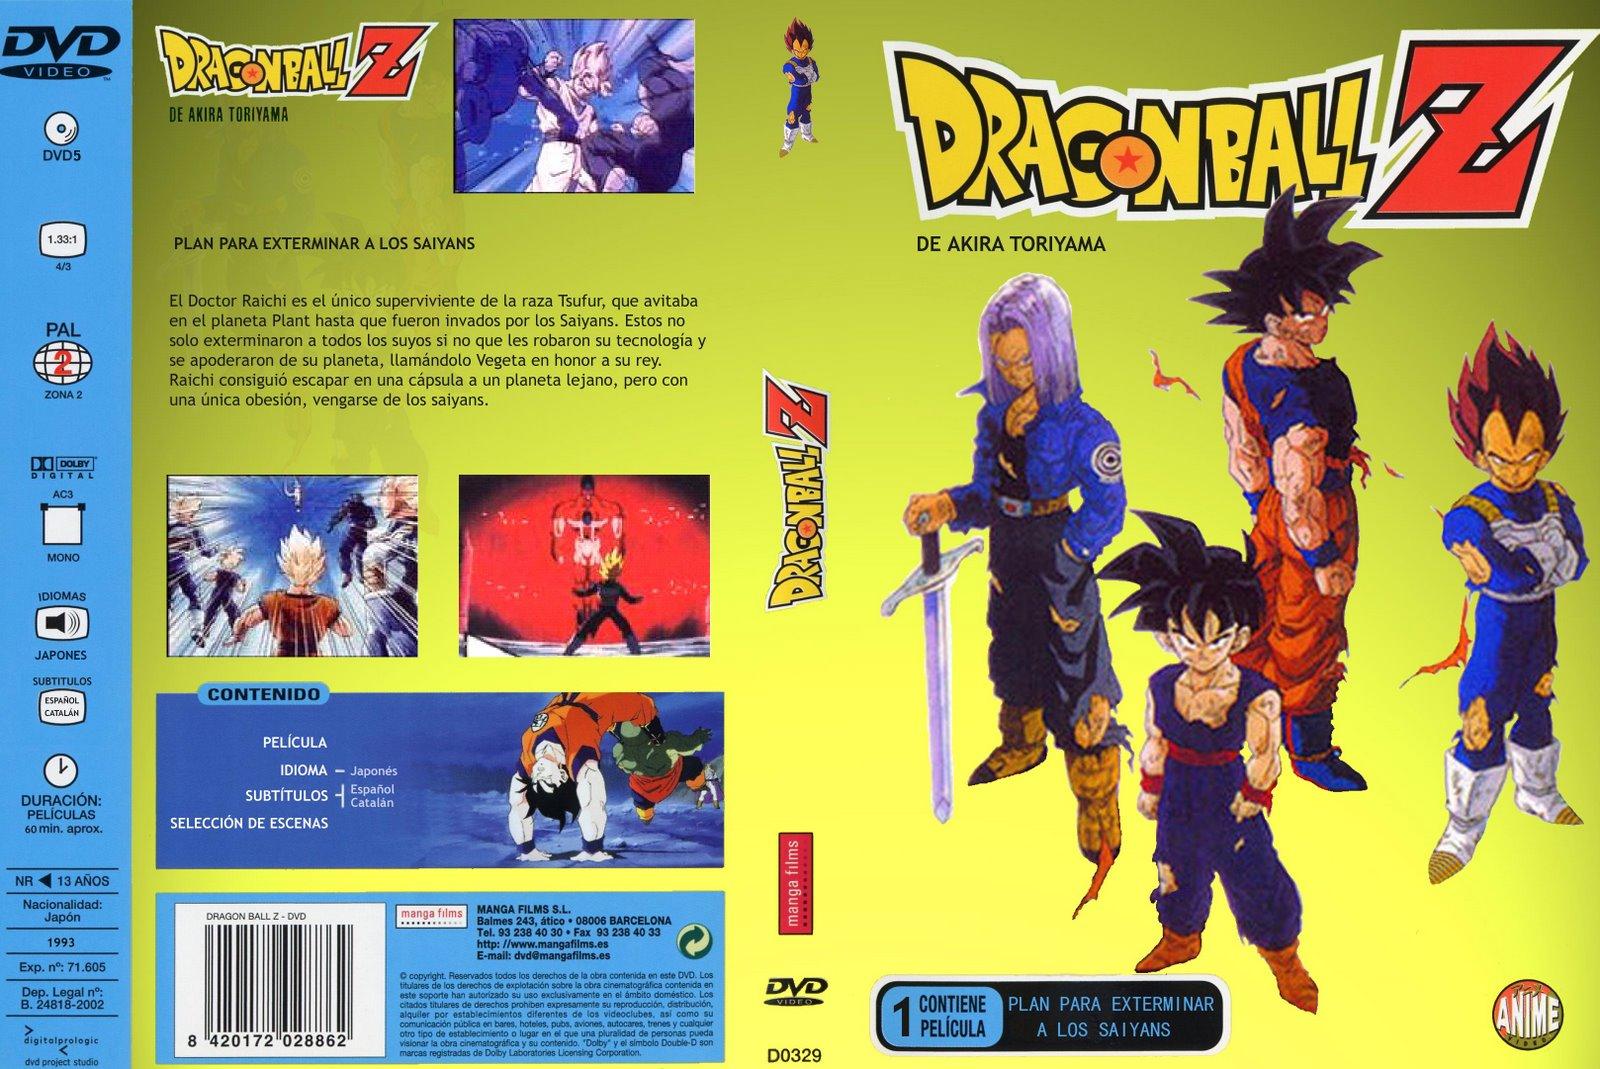 Imagen de la portada del DVD: